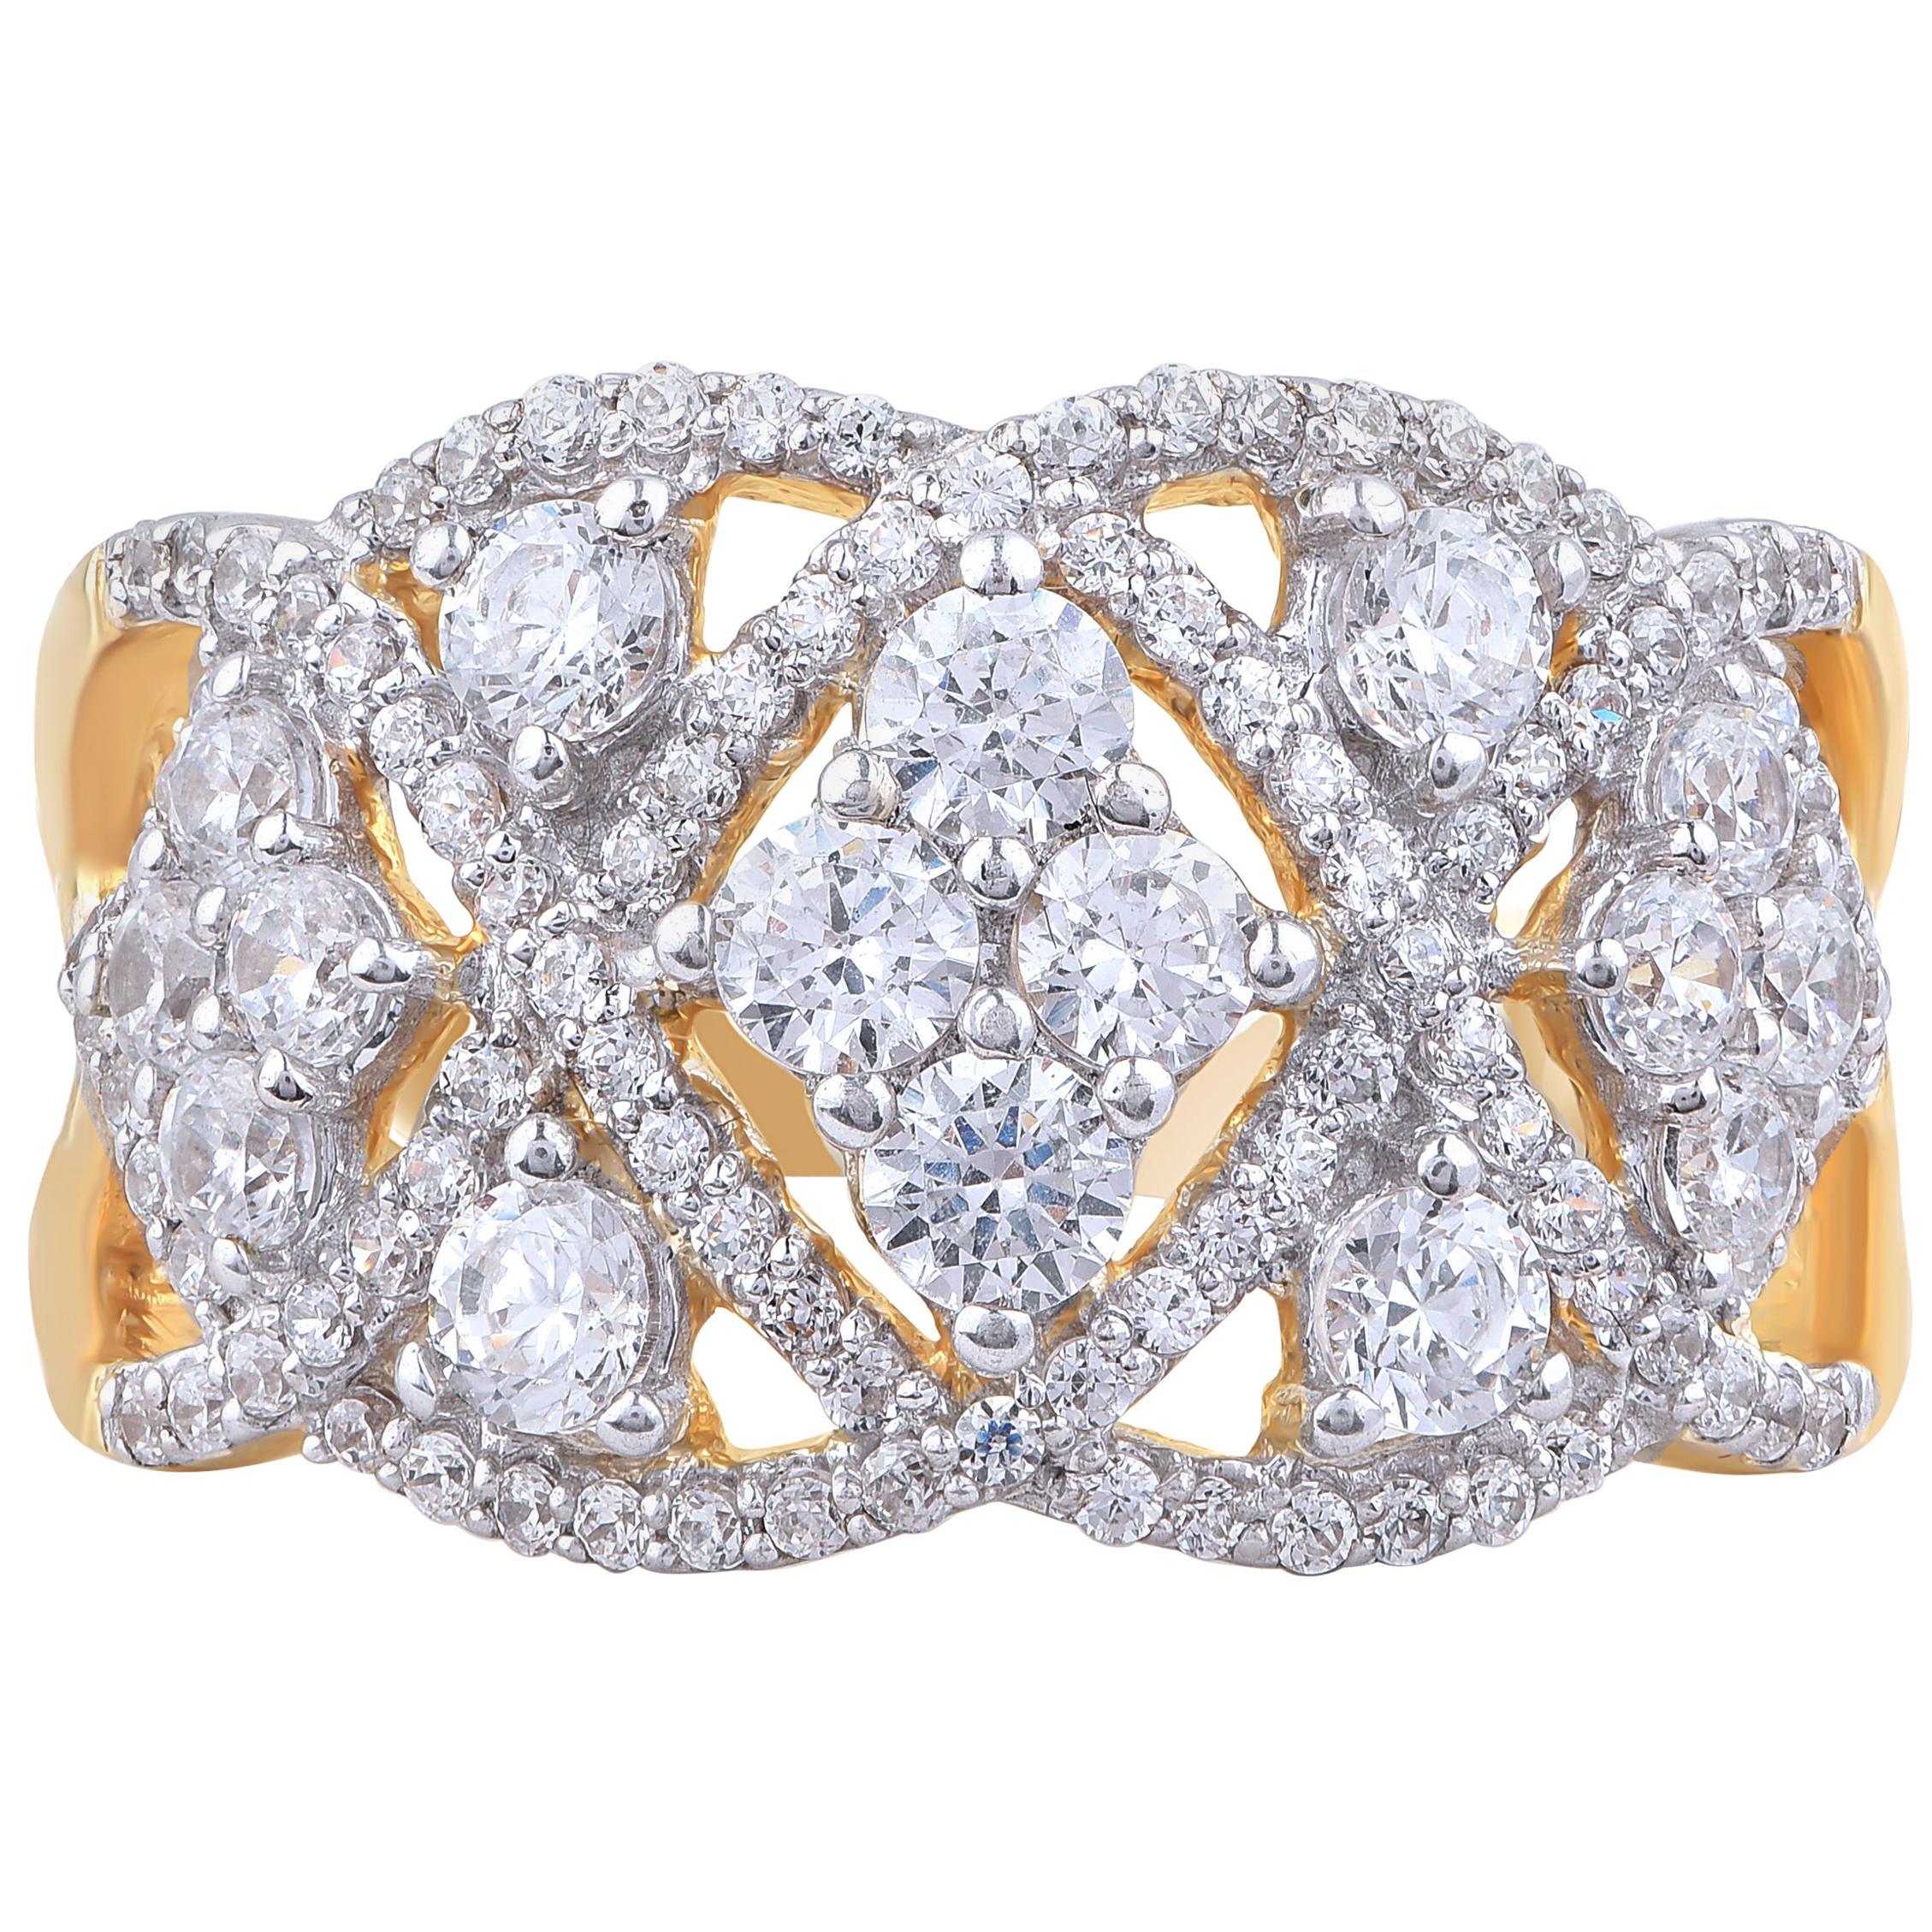 TJD 1.50 Carat Diamond 18 Karat Yellow Gold Composite Kite Design Wedding Band